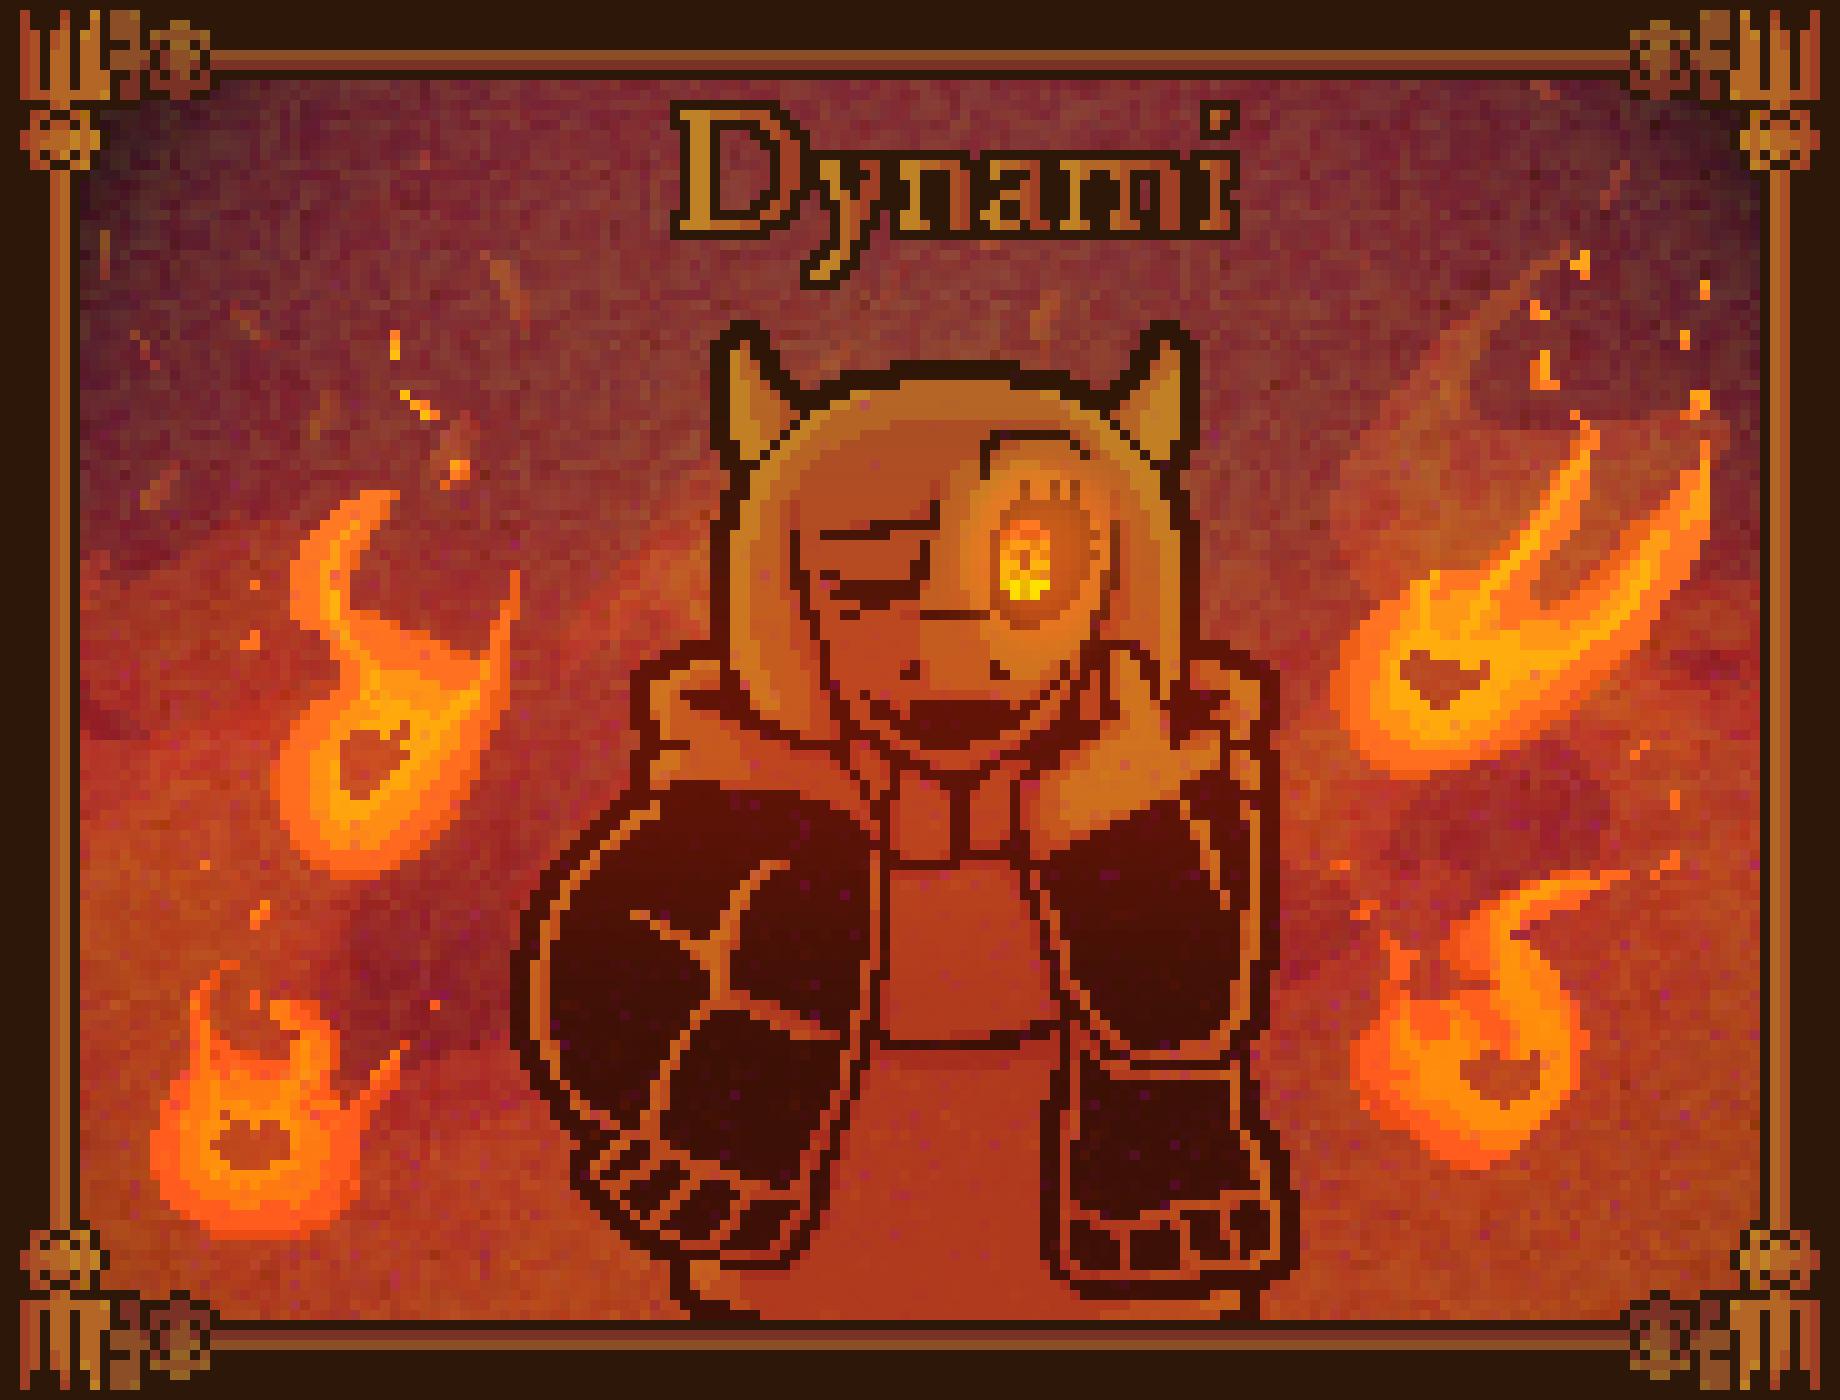 [AlterTale] - Dynami